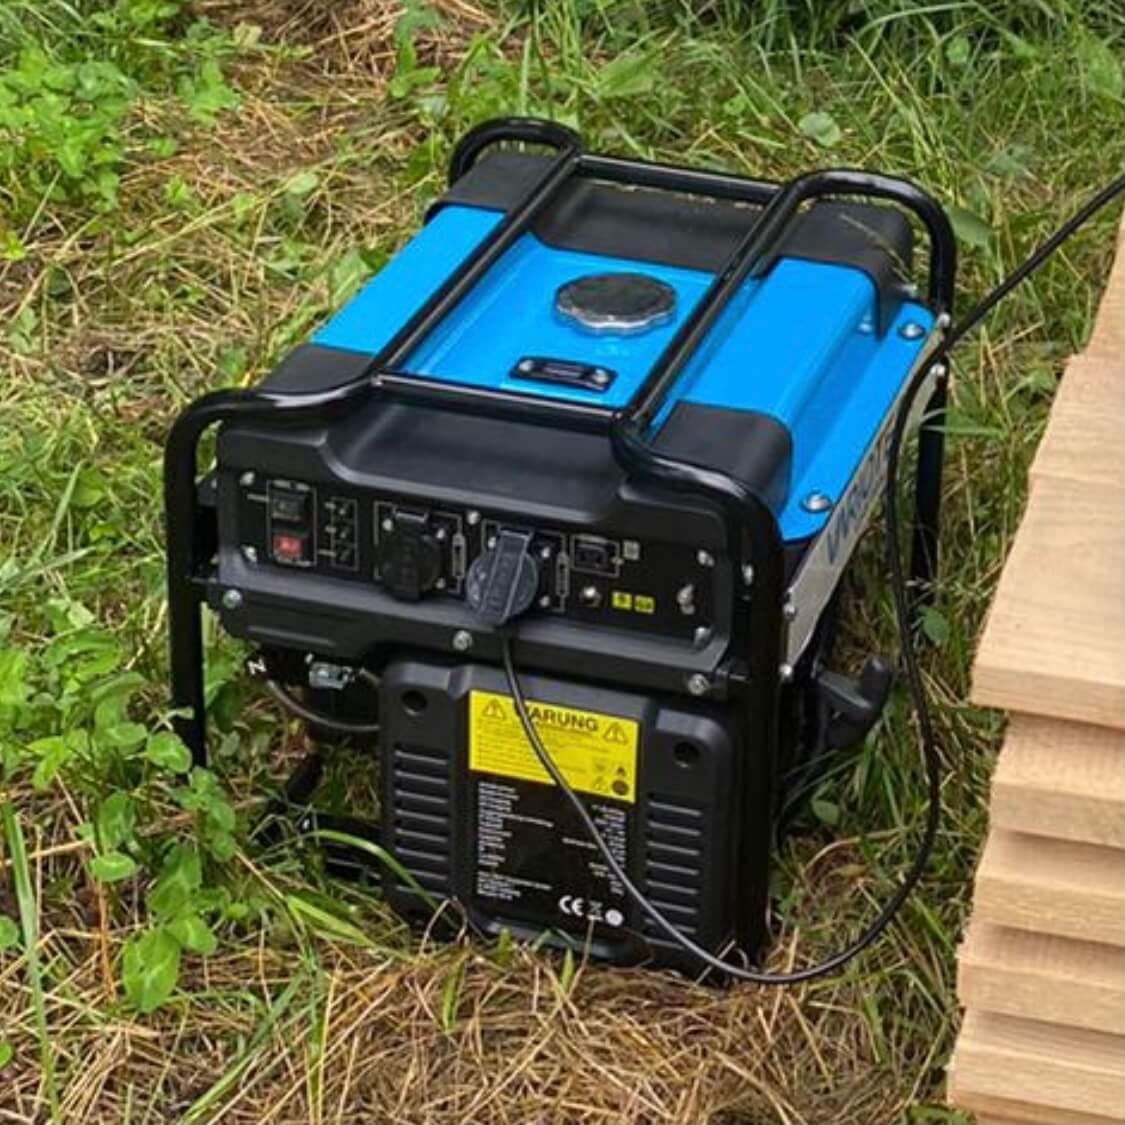 Stromerzeuger / Inverter-Generator 3400 Watt max. bzw. 3200 Watt Dauerleistung